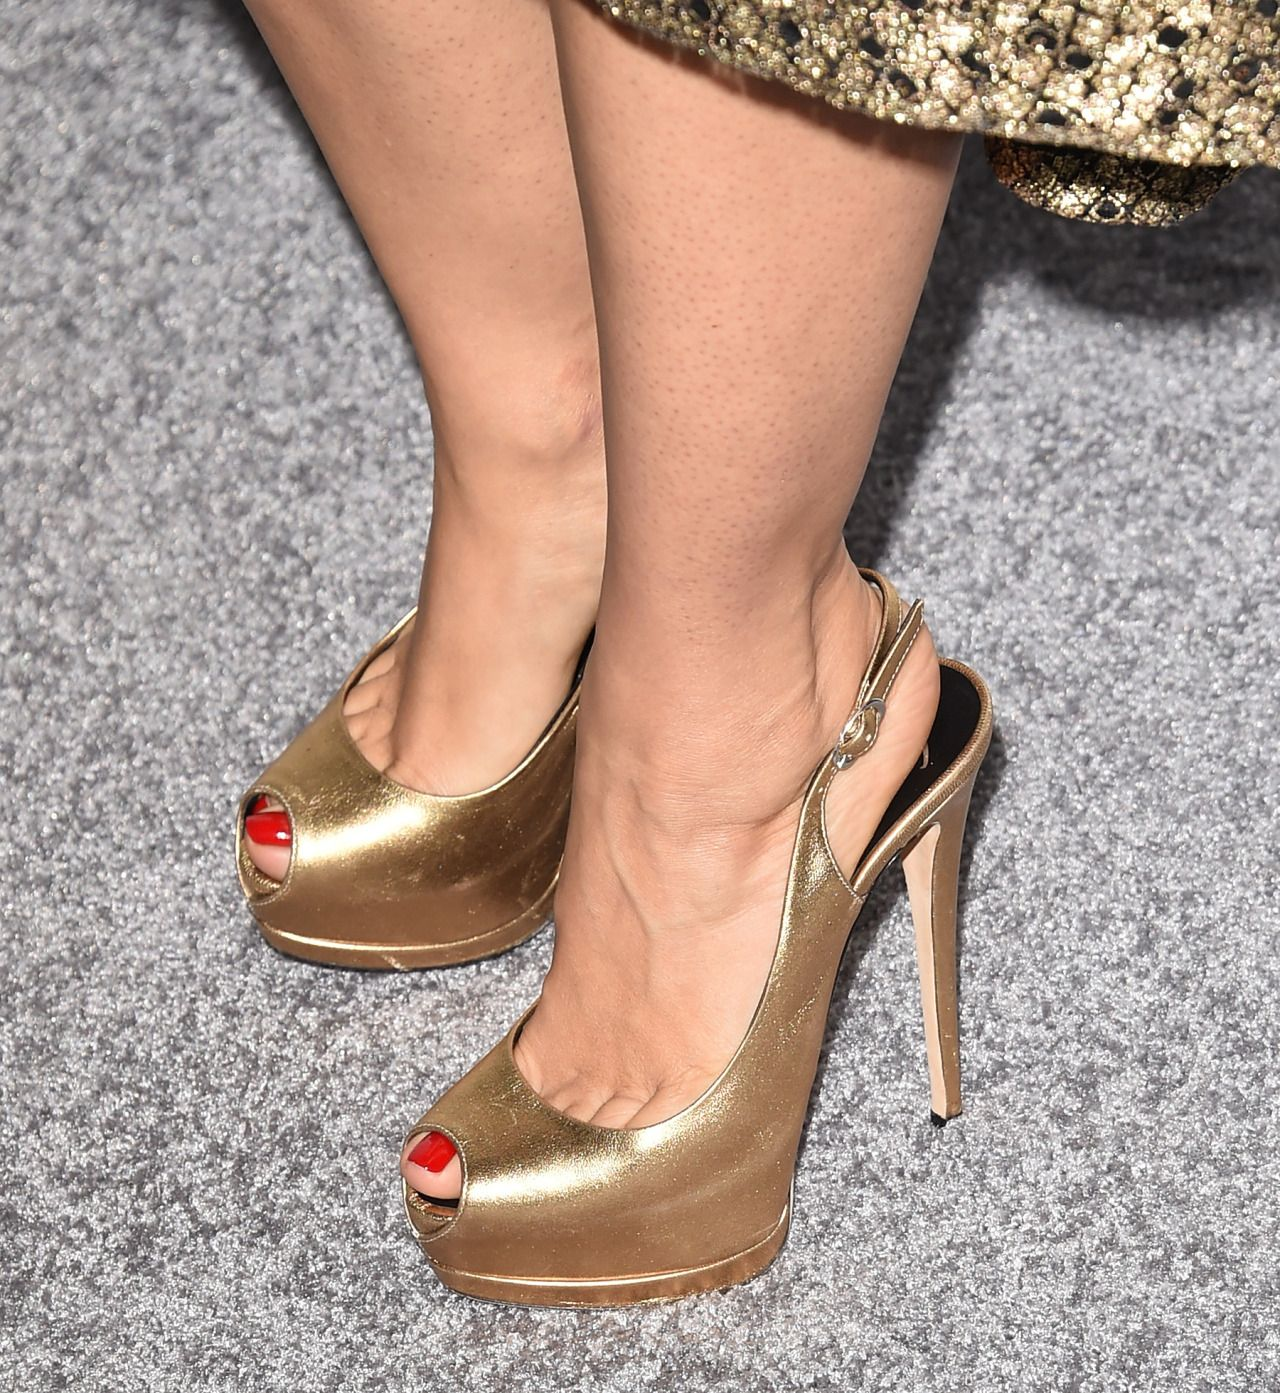 baa34c96d190d Toe Cleavage Forever : Photo | Slingbacks | Shoes, Heels, Celebrity ...